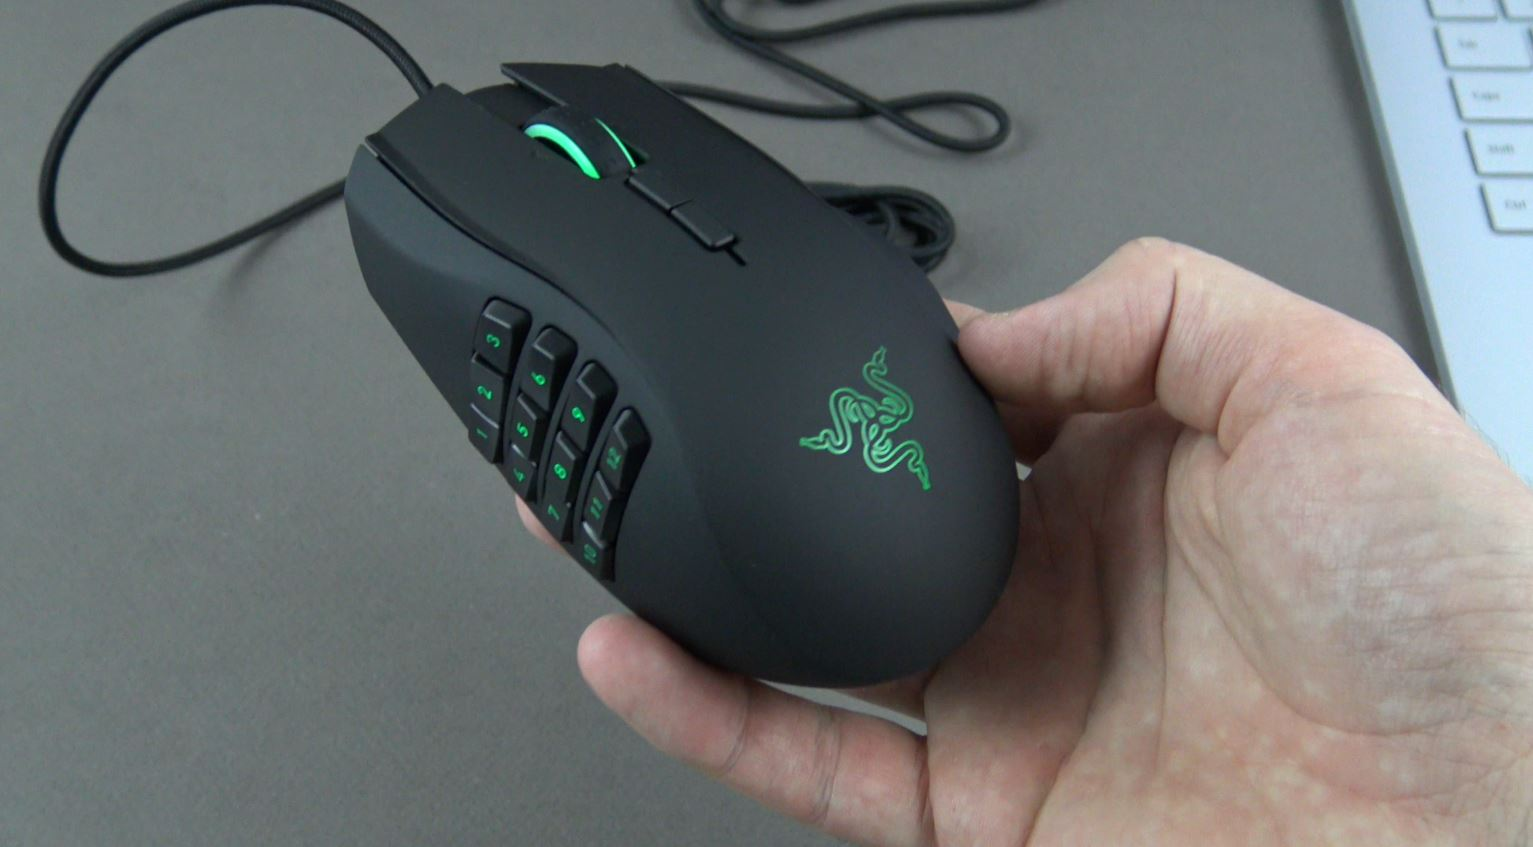 Razer Mouse Macro Software